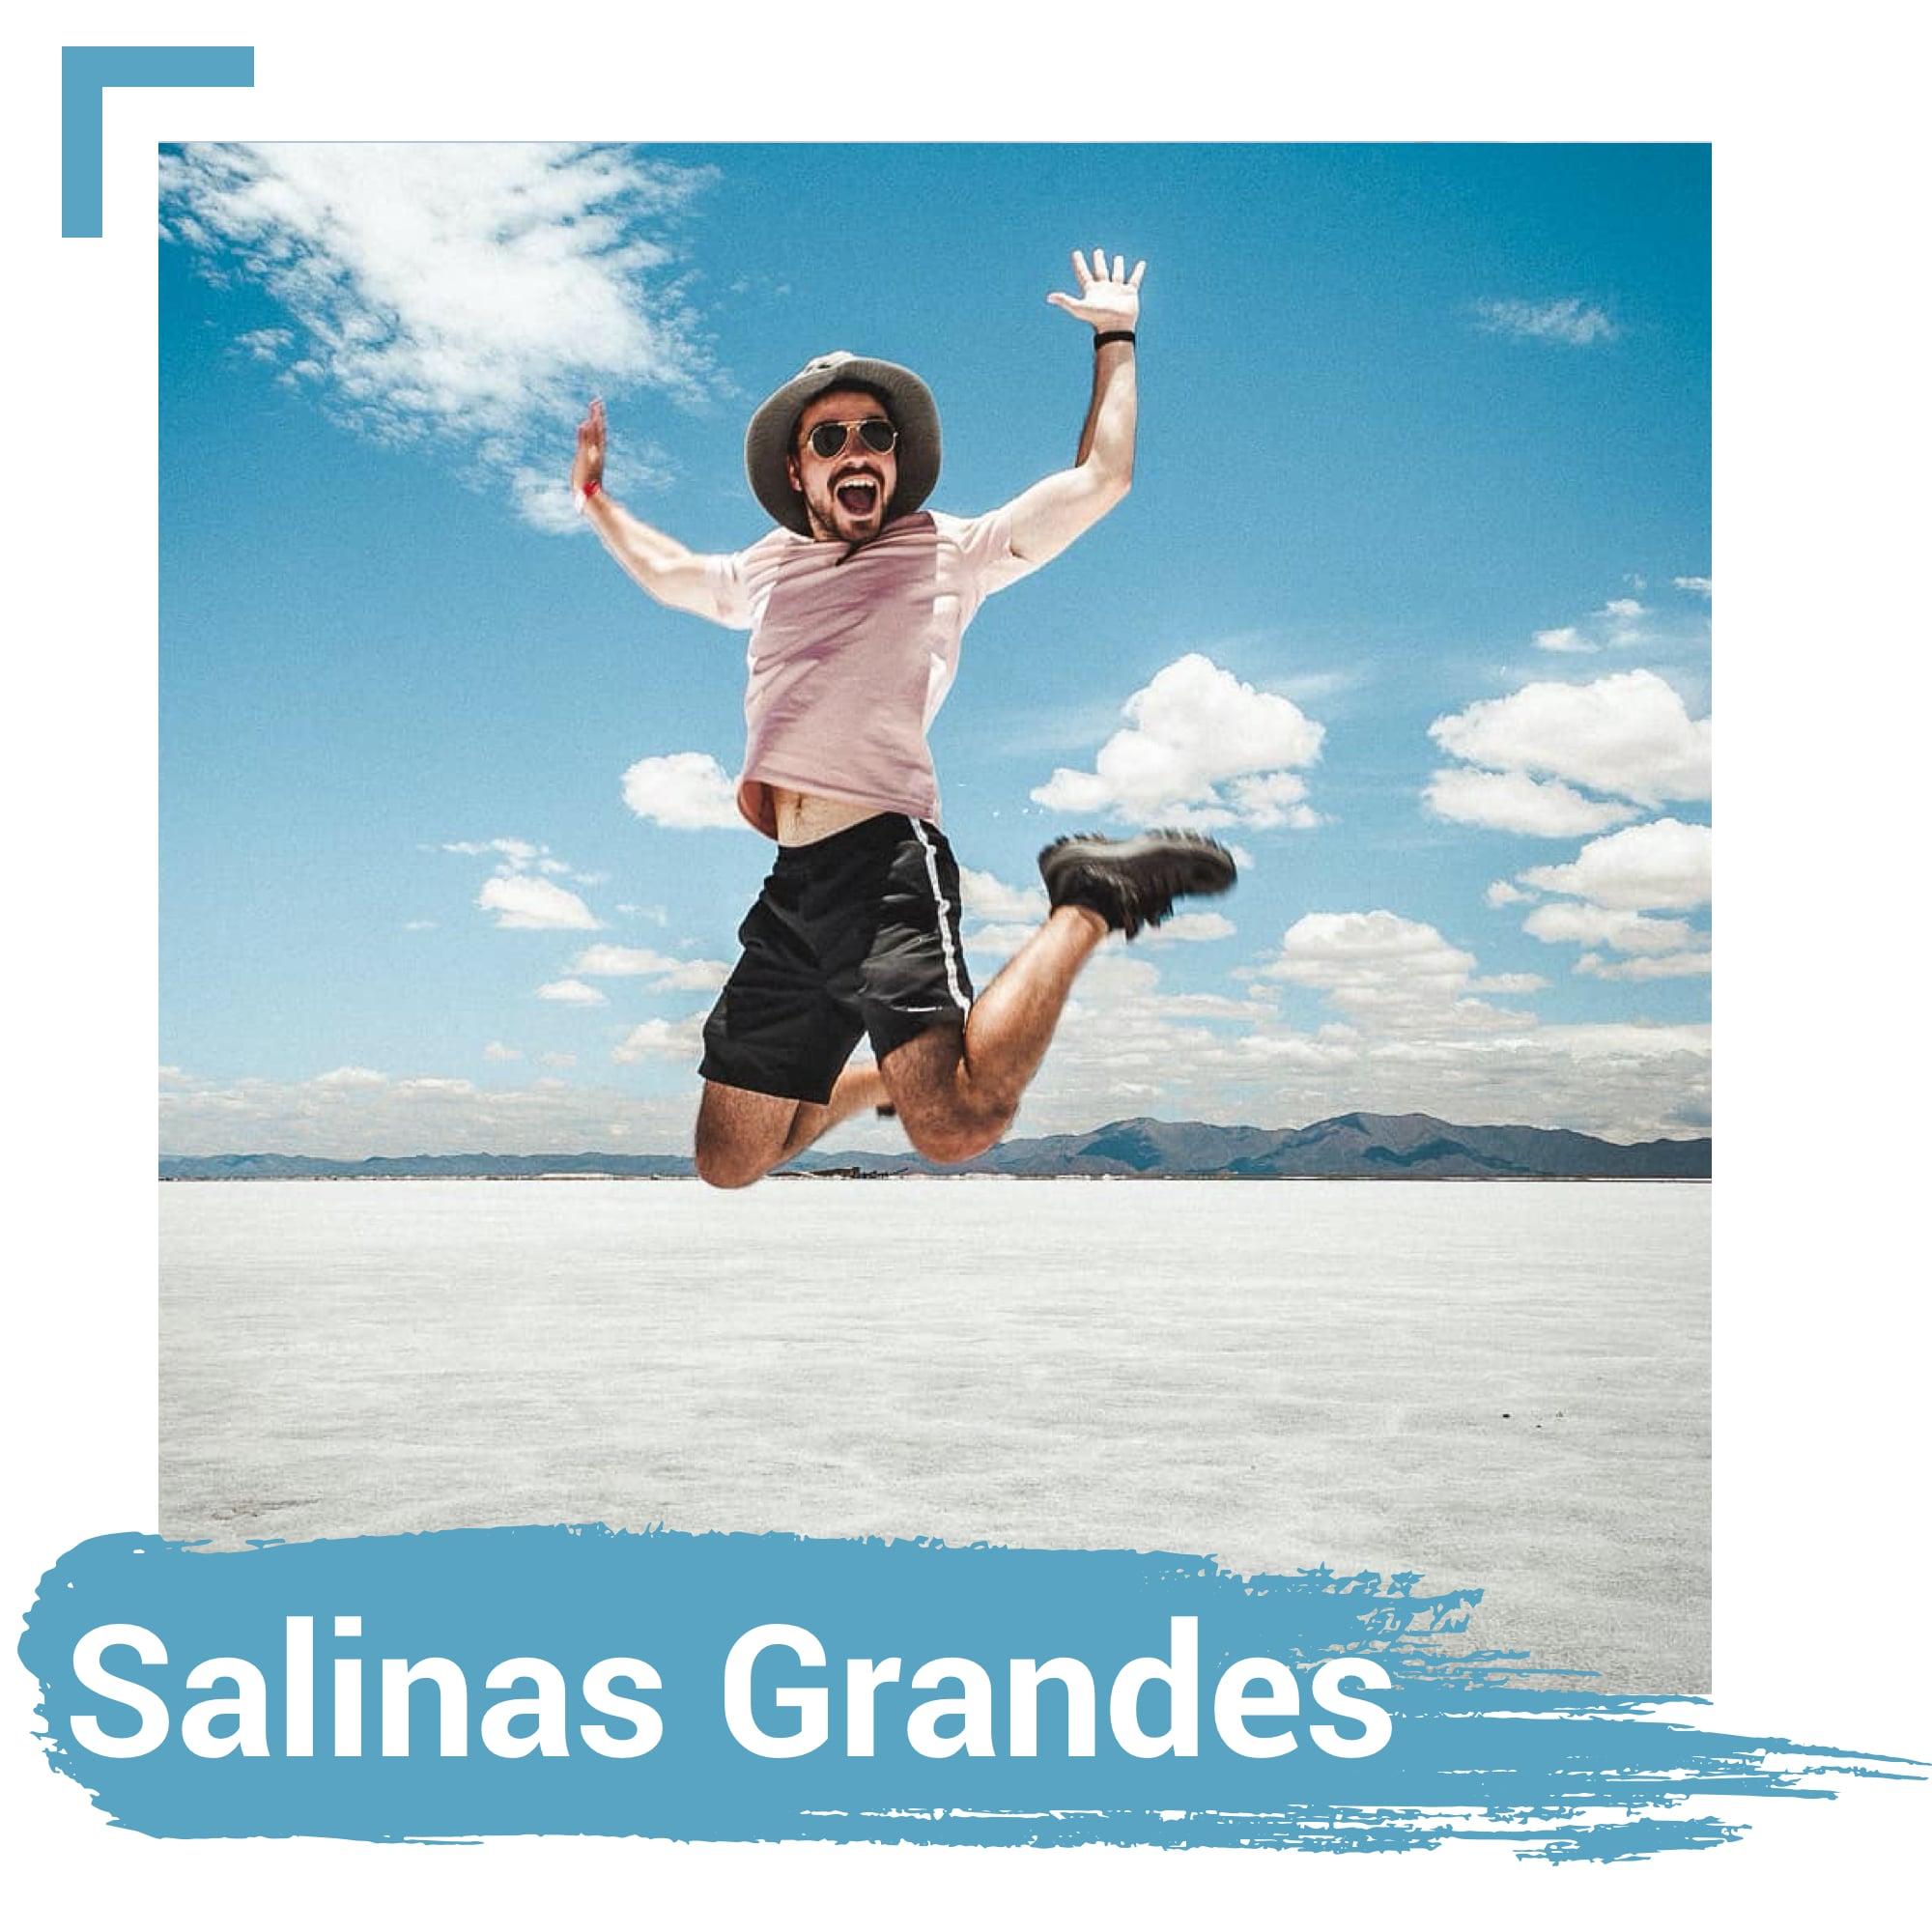 Salinas Grandes in Jujuy